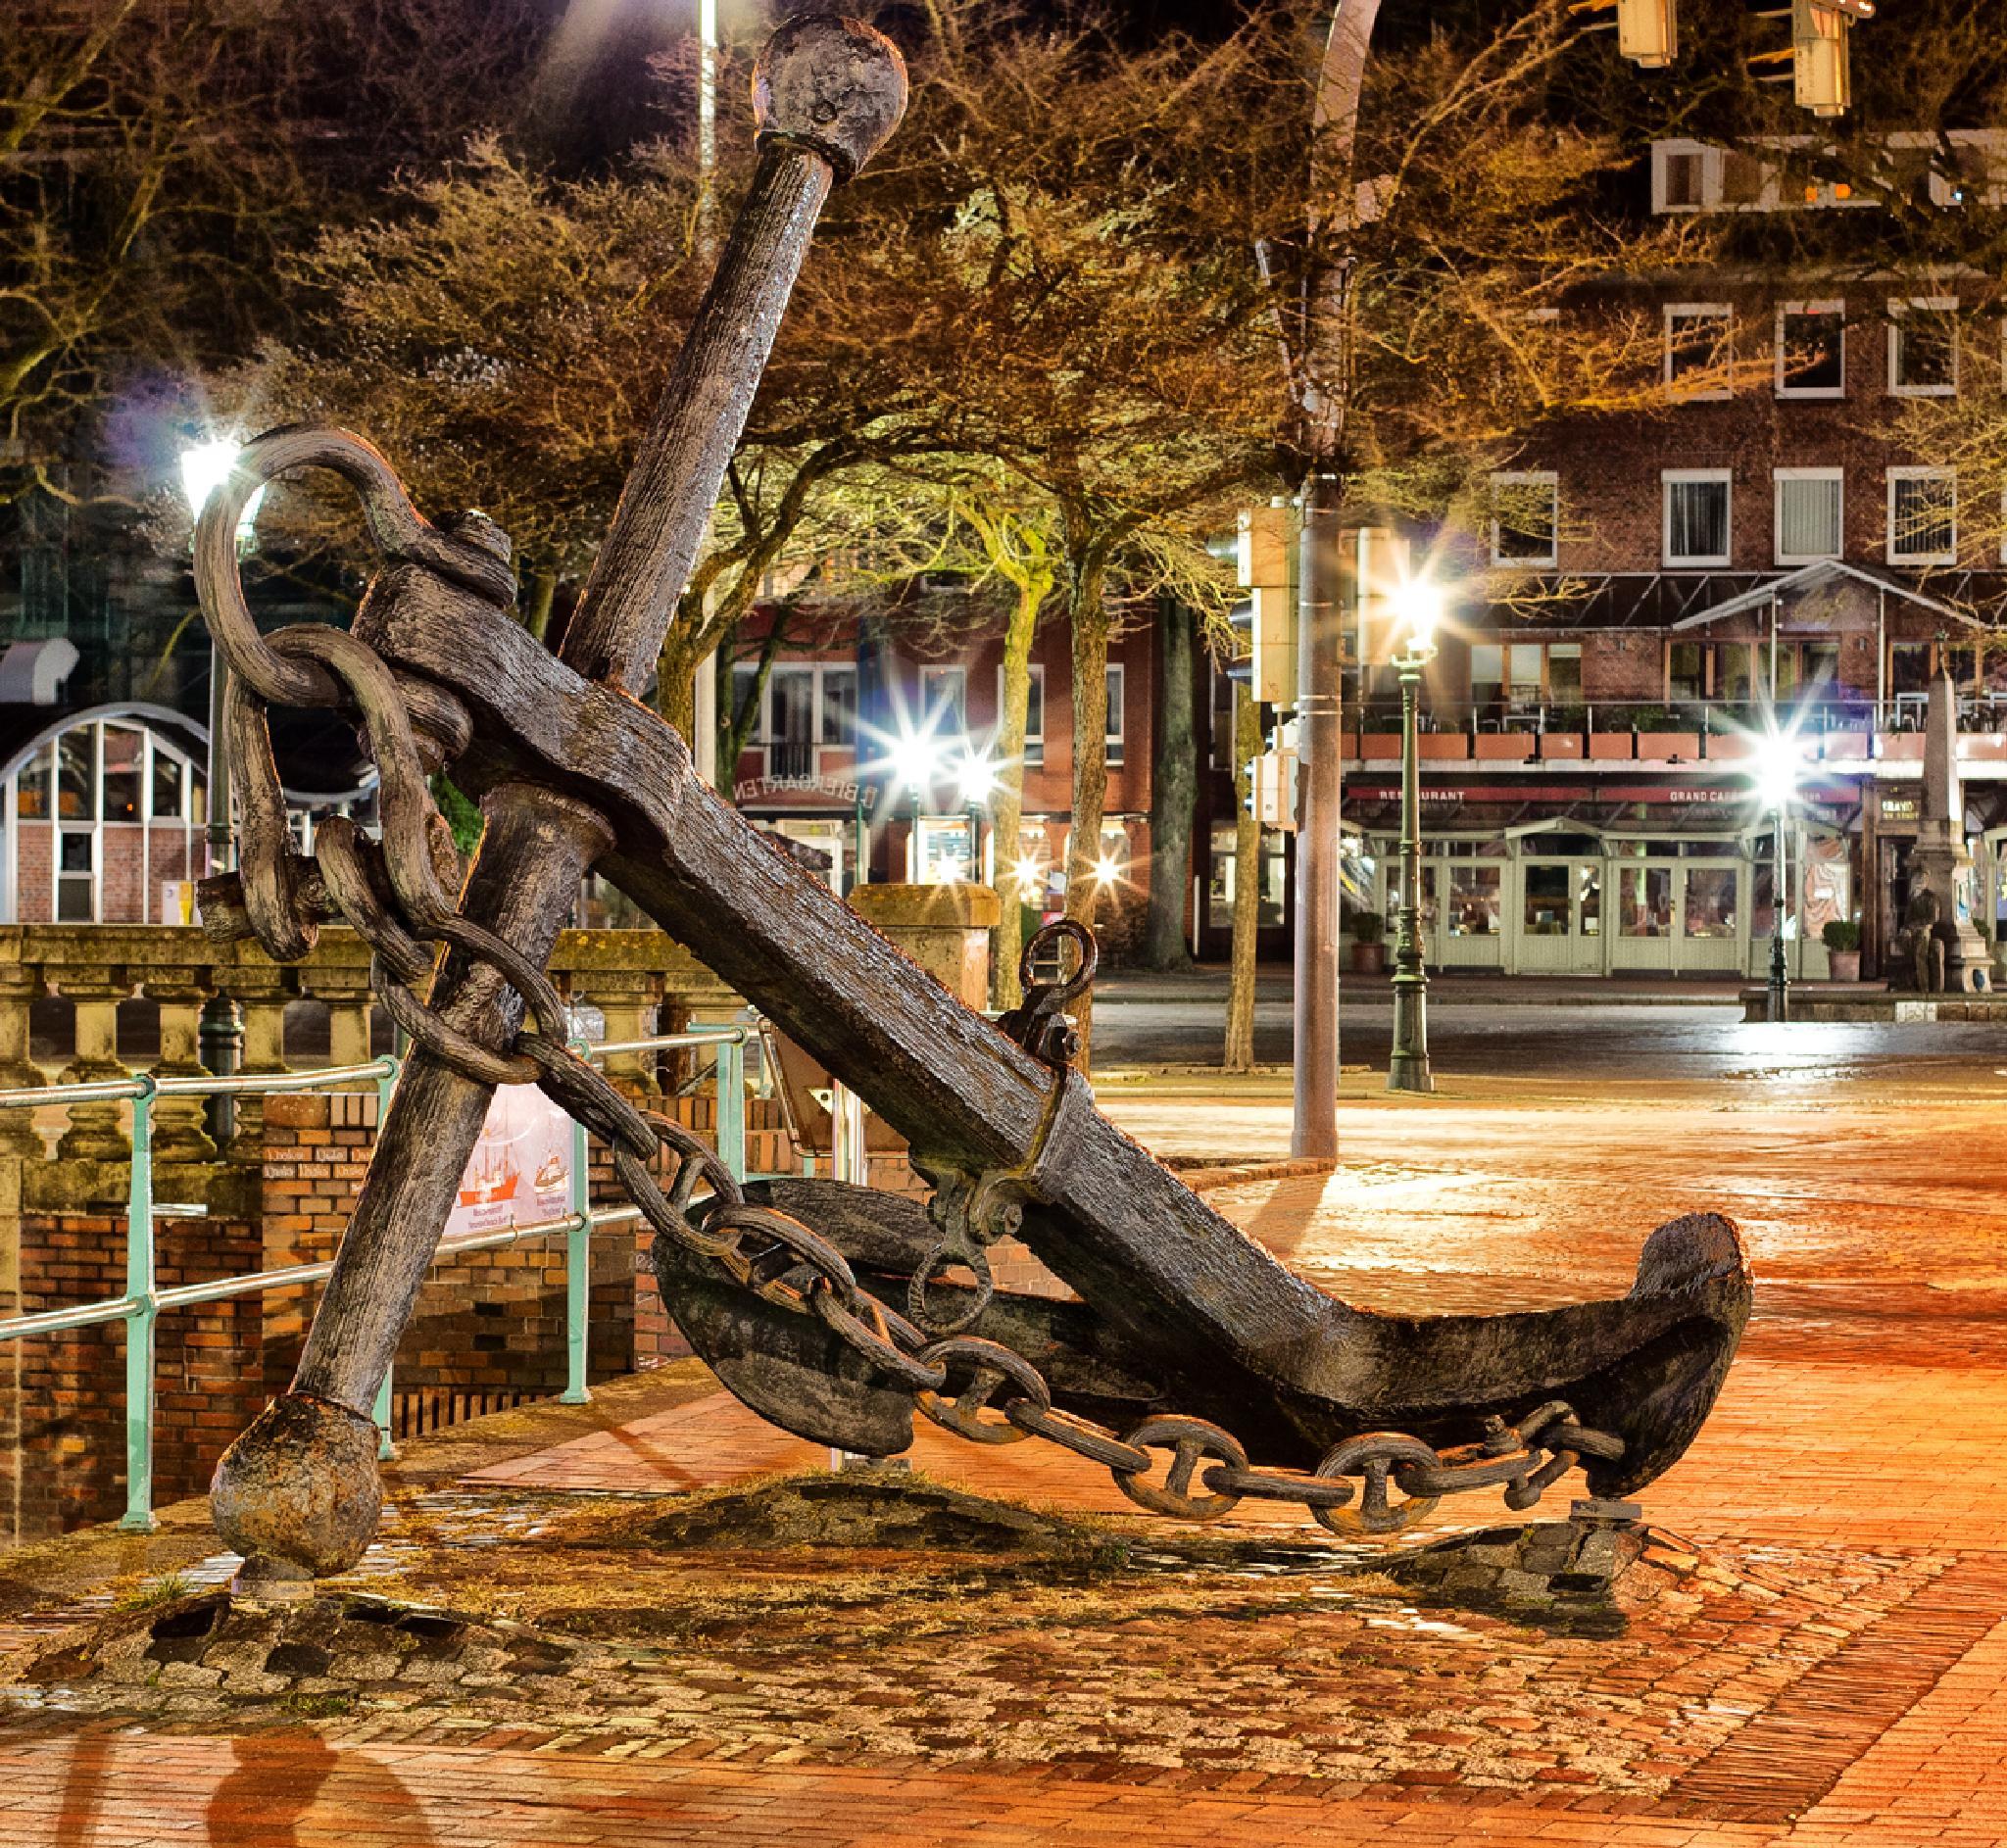 Anchor Emden by martinhopf1990